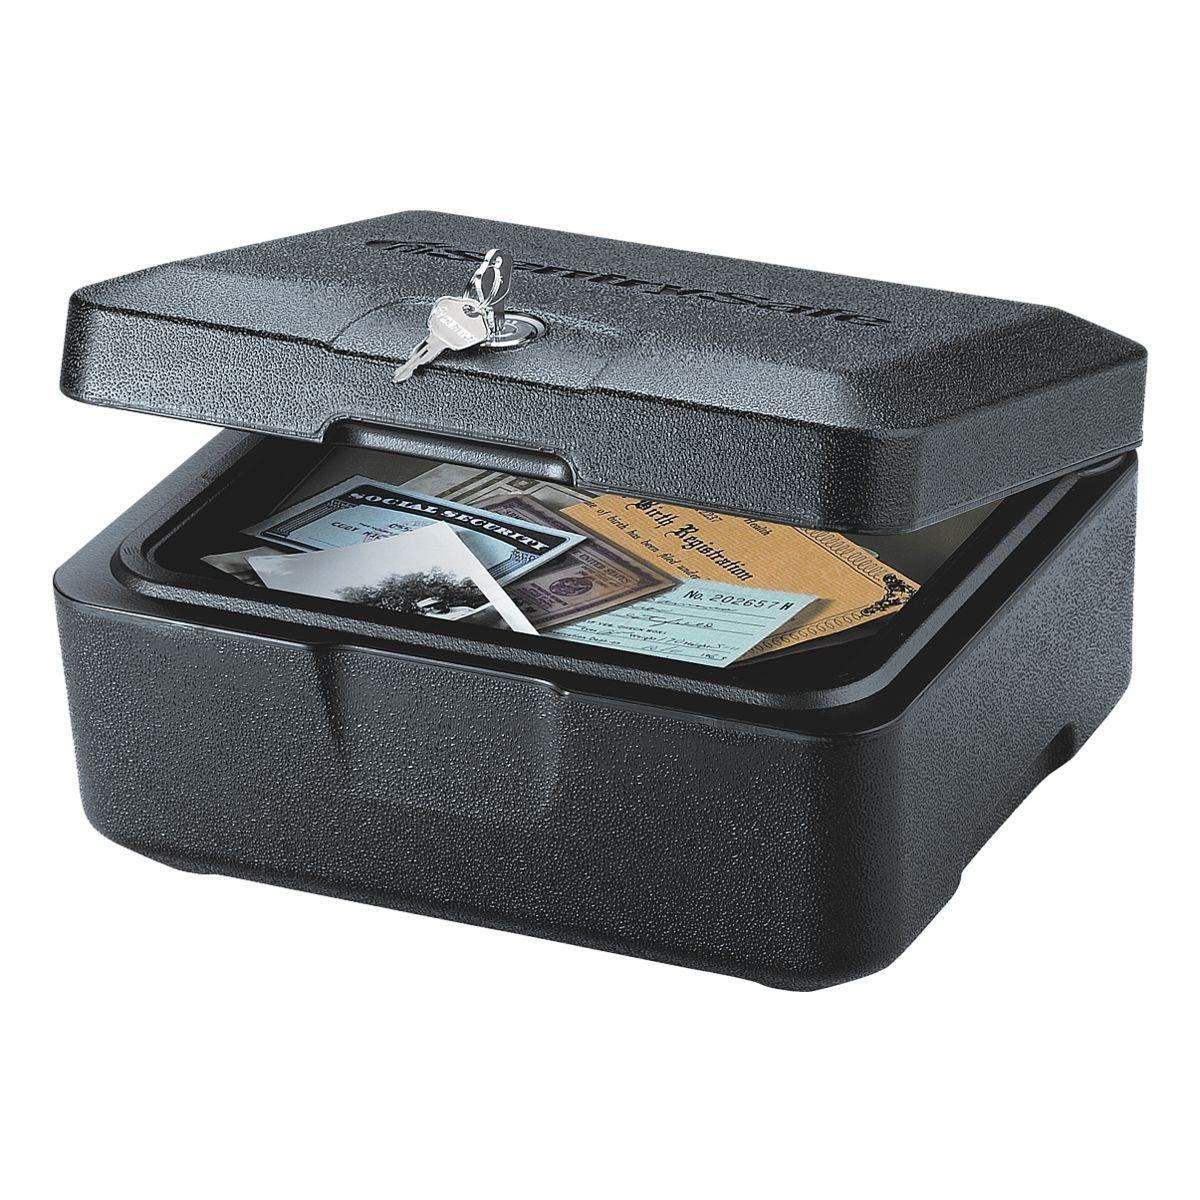 ROTTNER Feuerschutzkassette »Sentry Safe 0500«